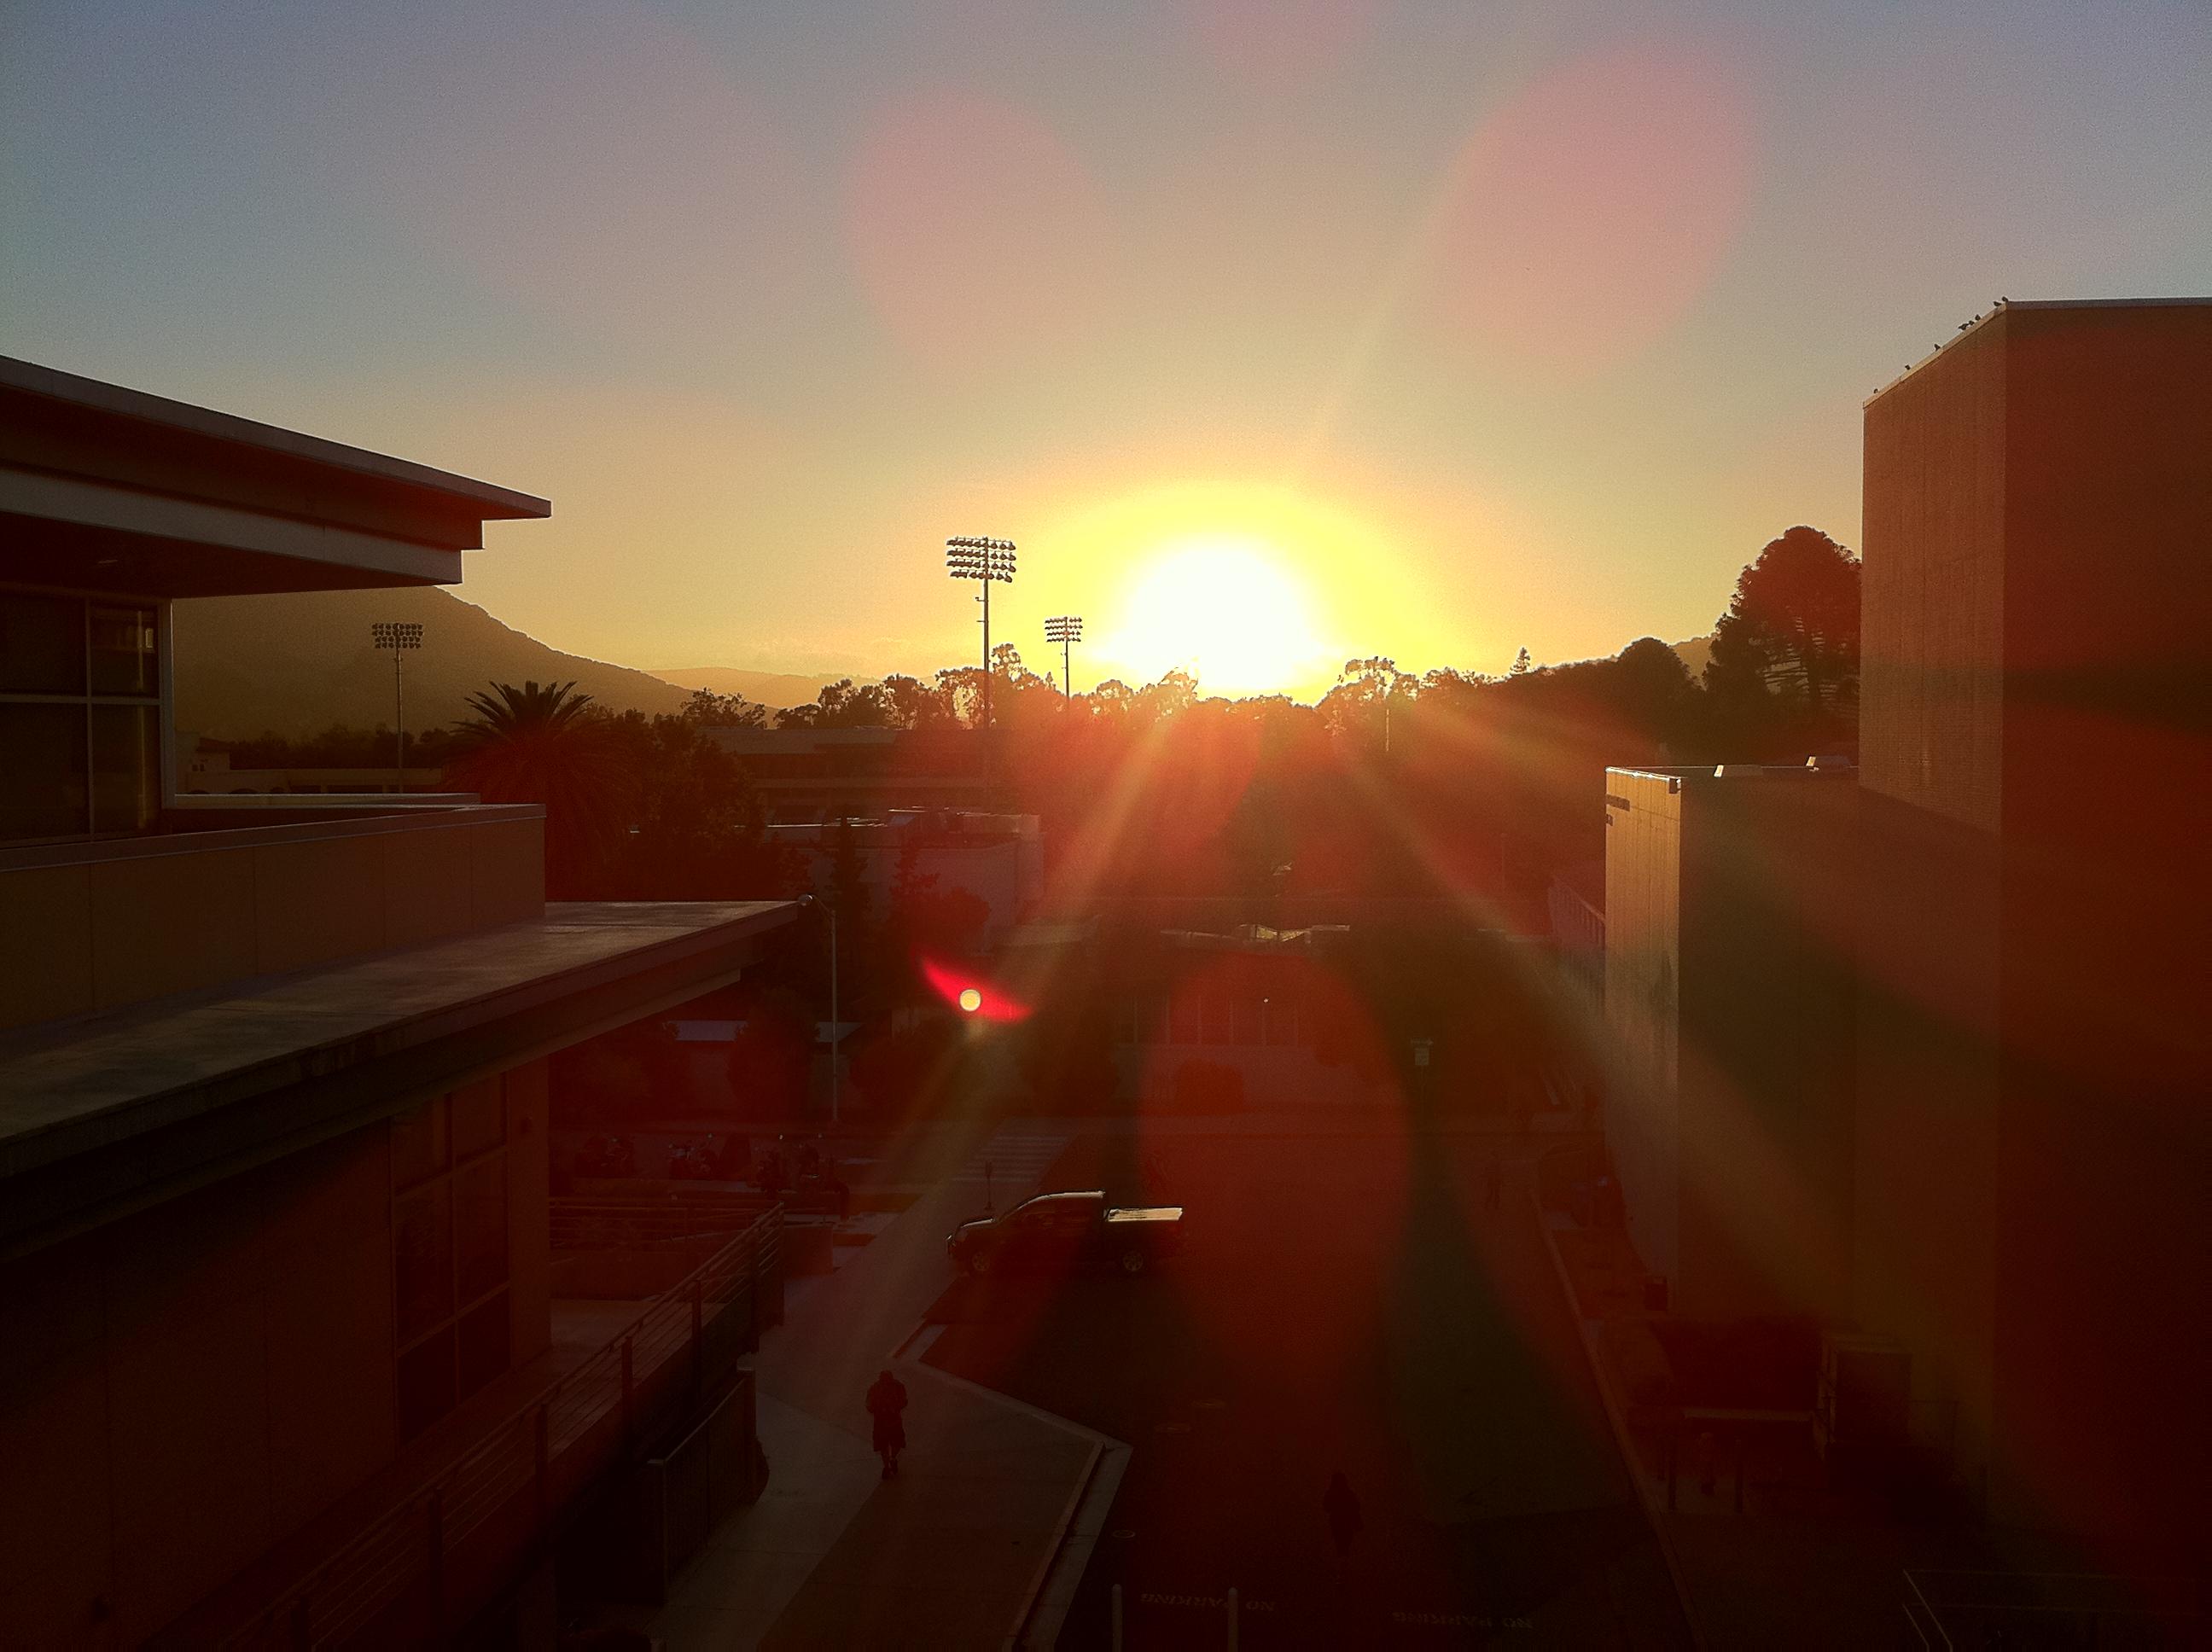 Sunset, Buildings, Dusk, Flare, Lens, HQ Photo